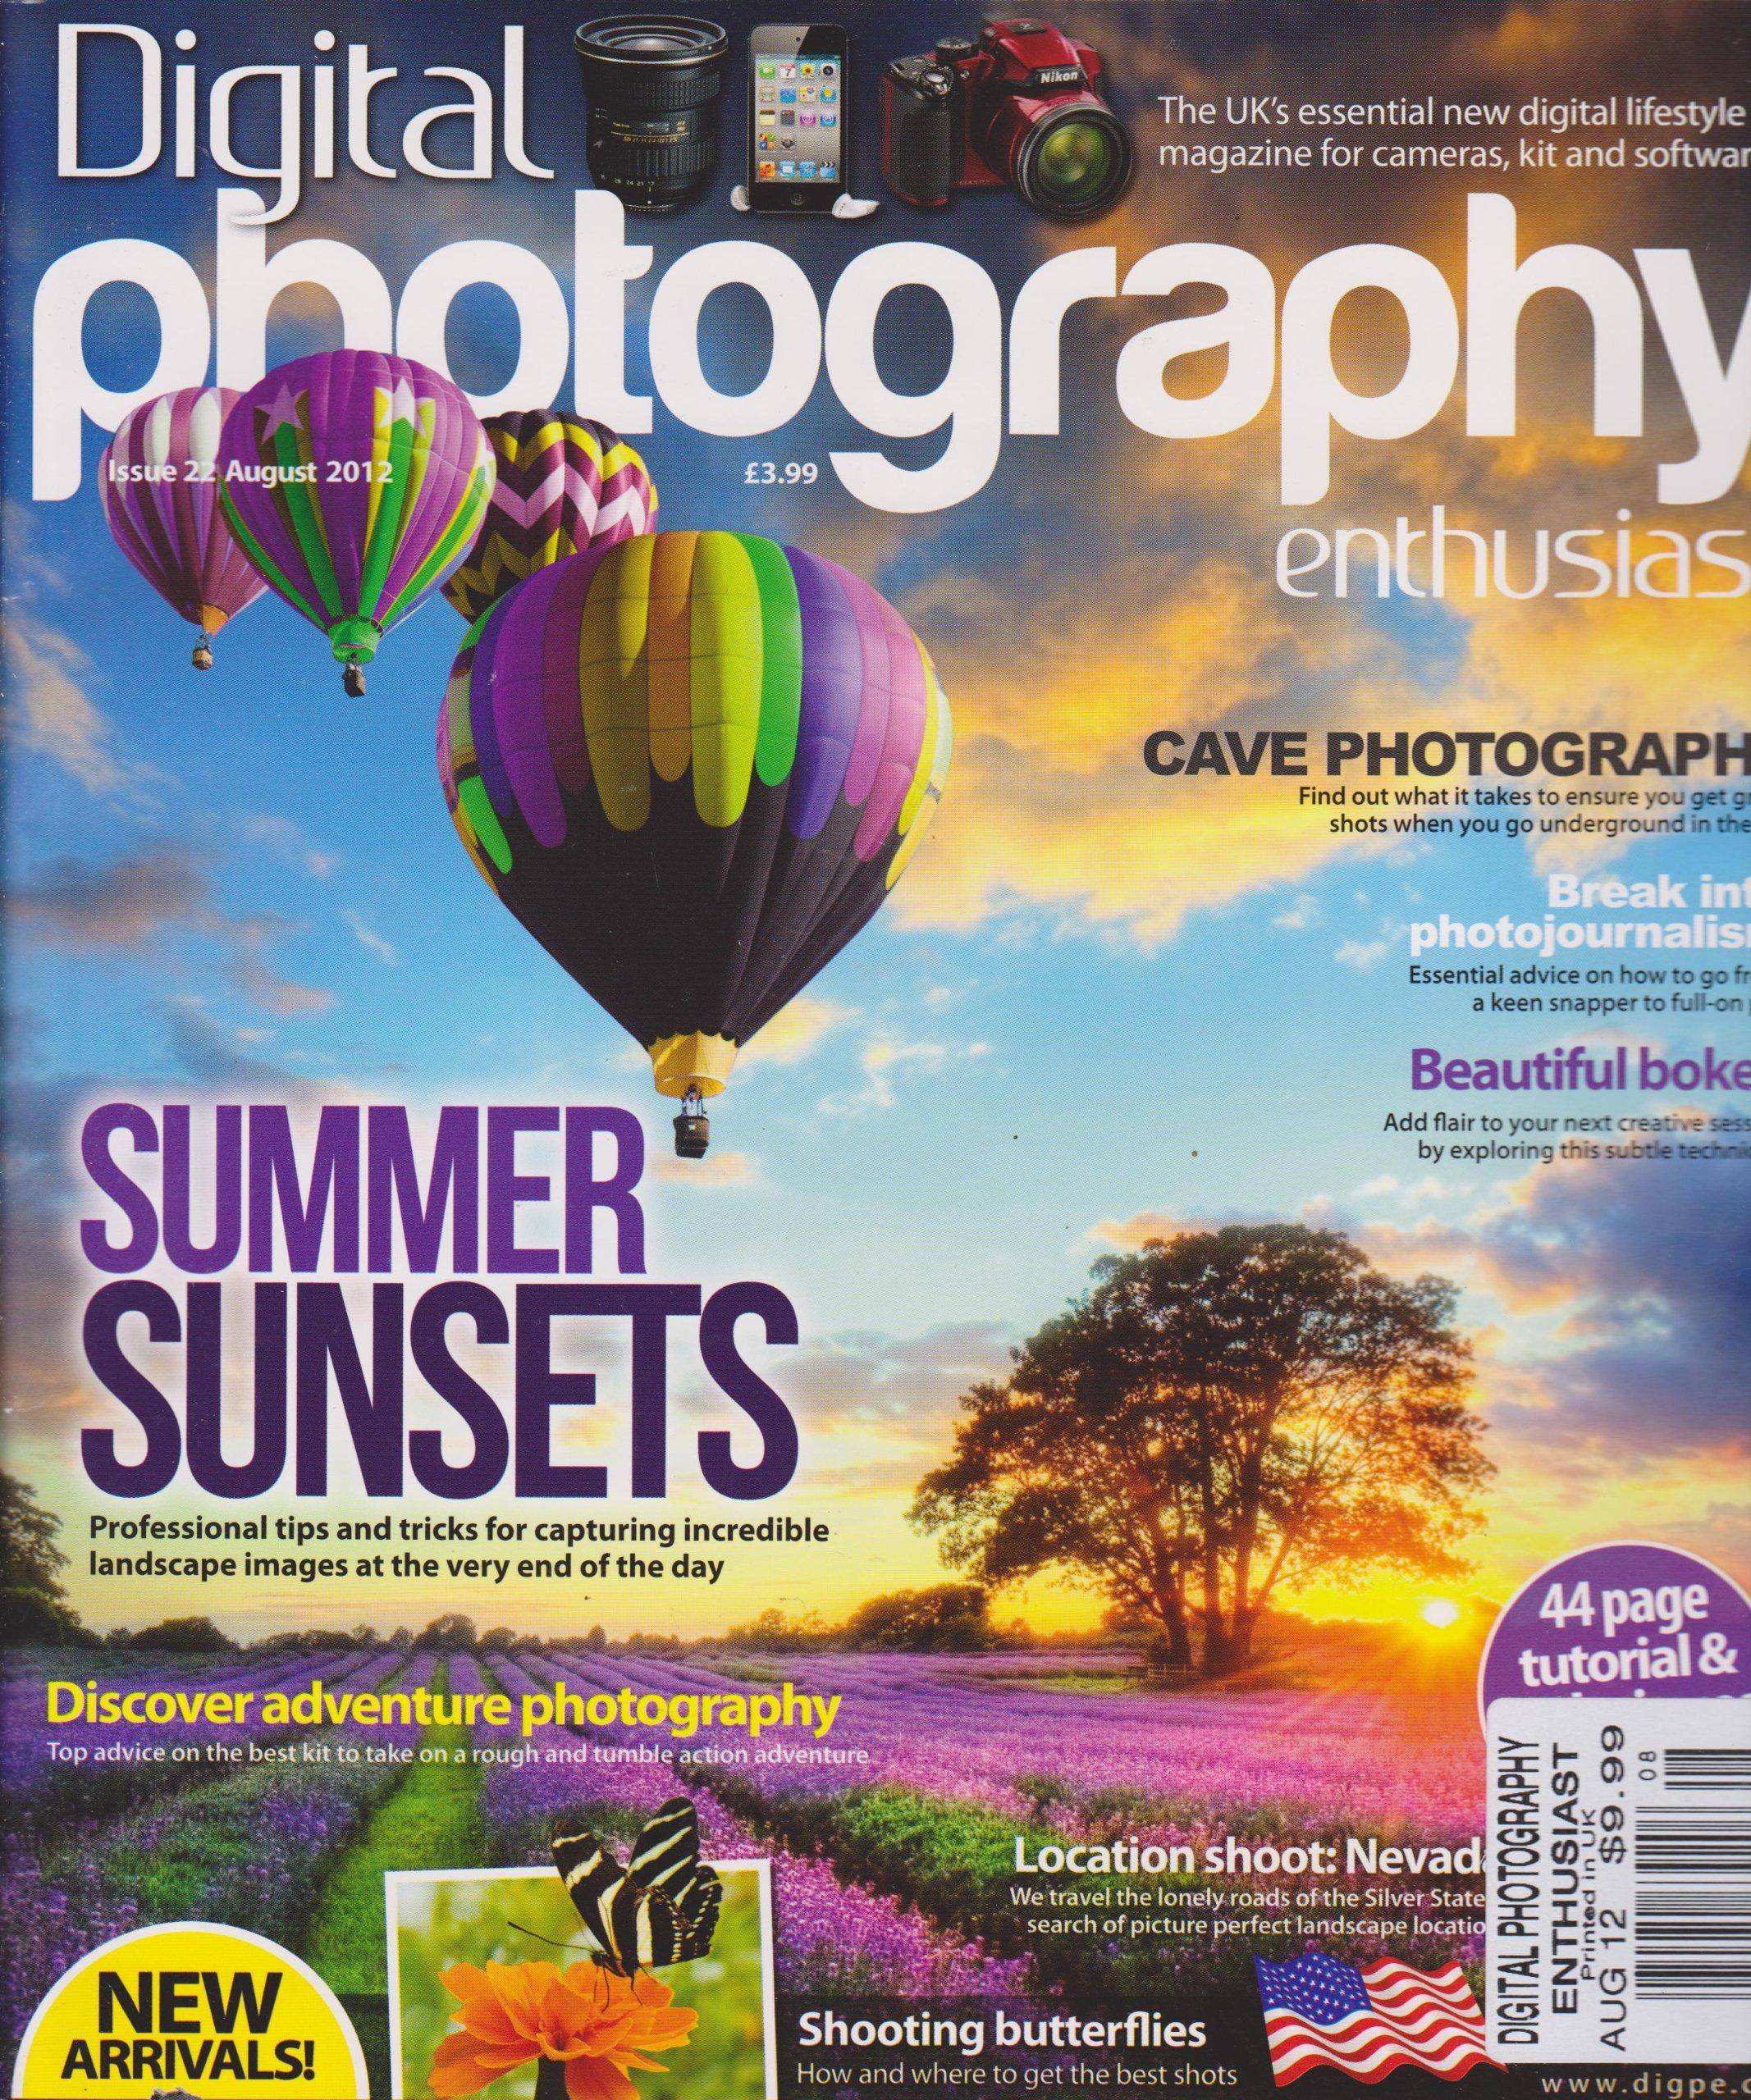 Digital Photography Enthusiast (August 2012) ebook